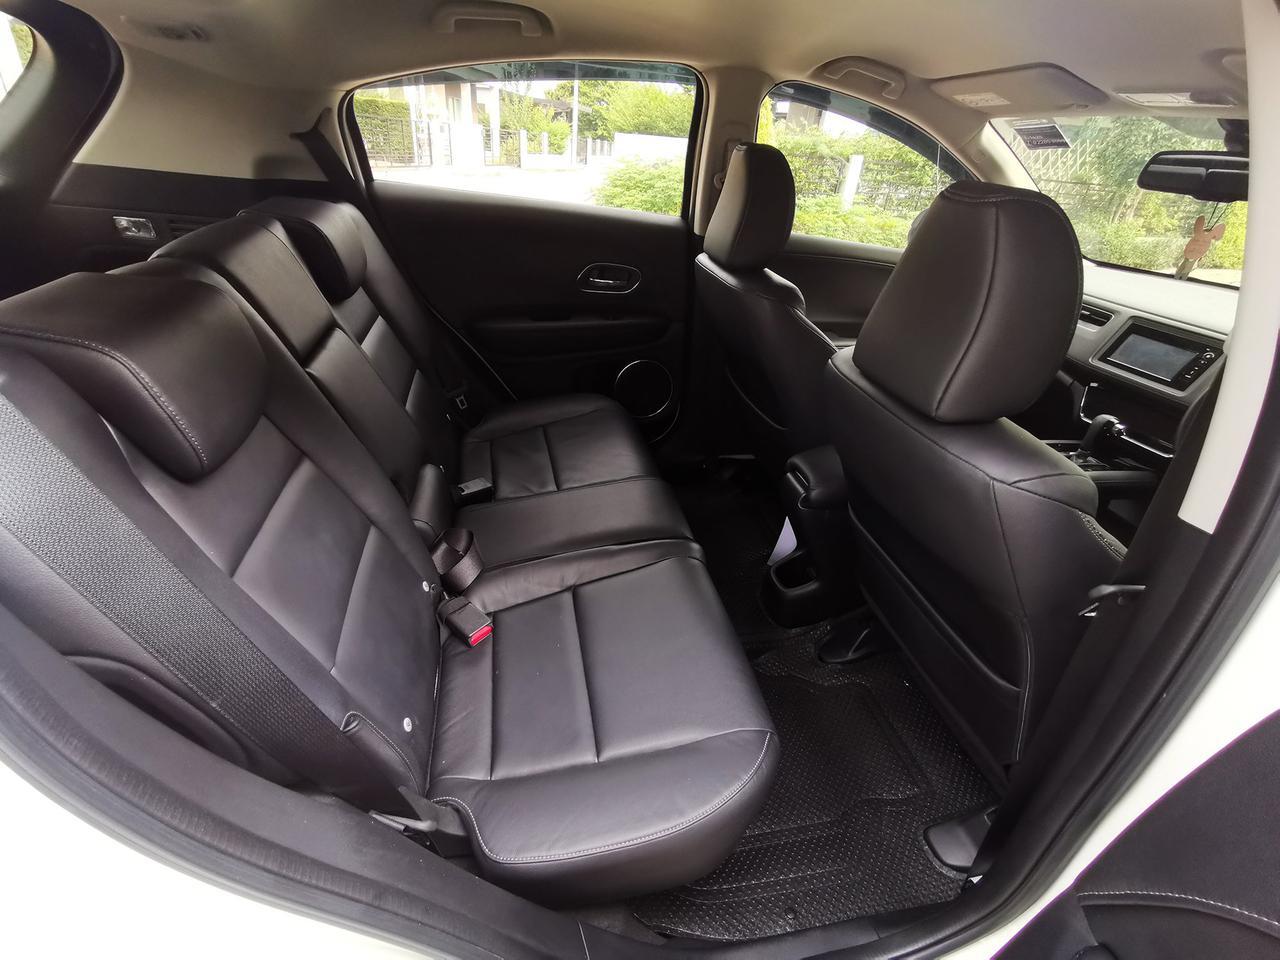 Honda HR-V 1.8 E Limited (ปี 2018) SUV AT รูปที่ 4